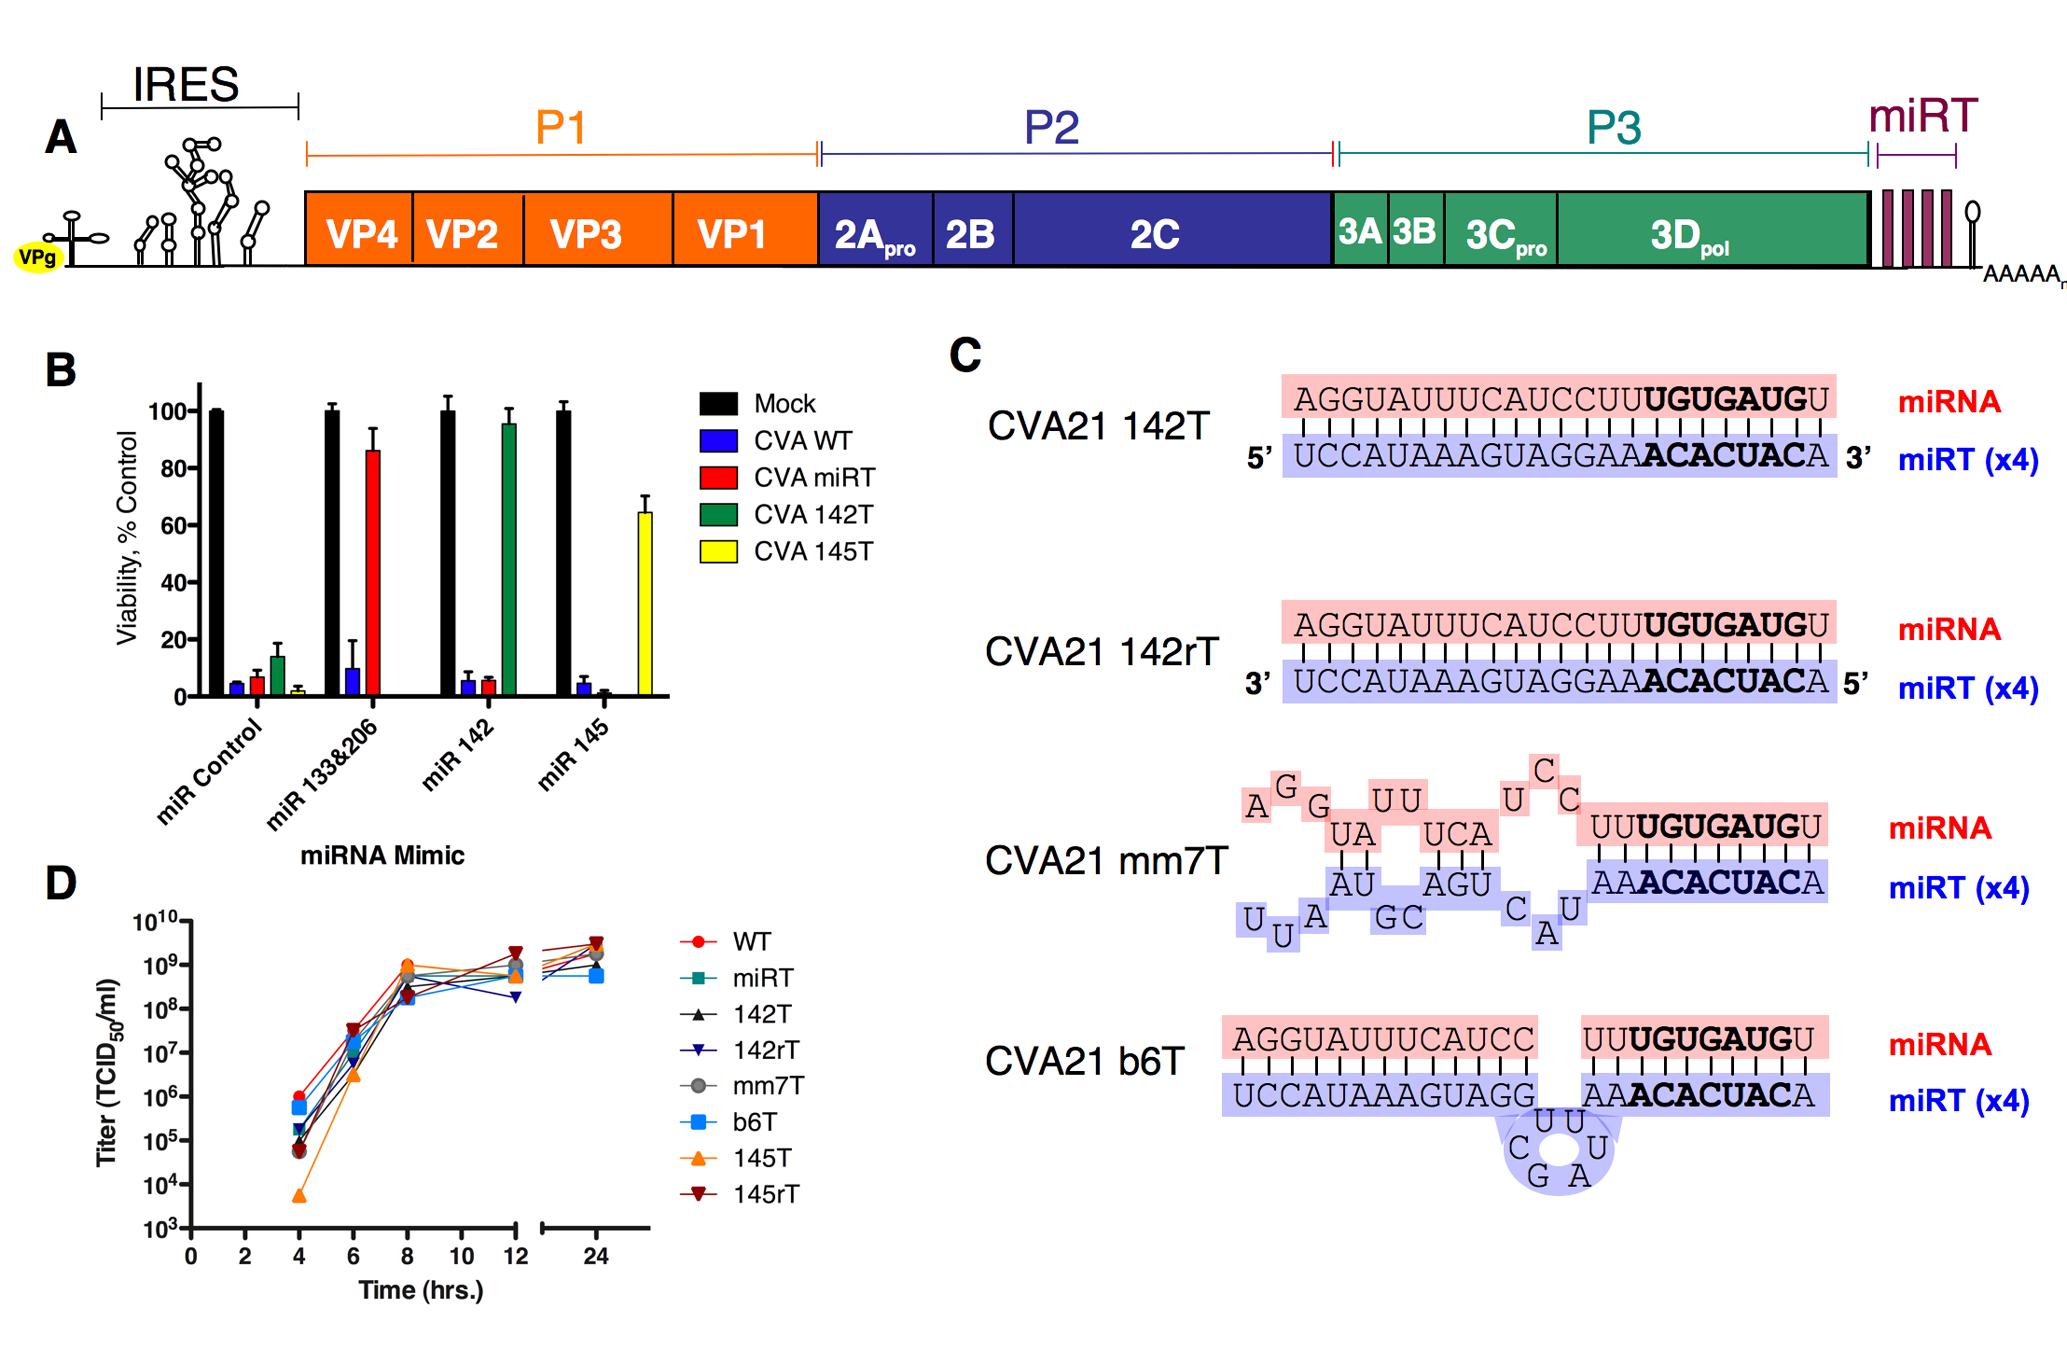 Schematics, growth kinetics, and permissivity of recombinant CVA21 in HeLa cells.